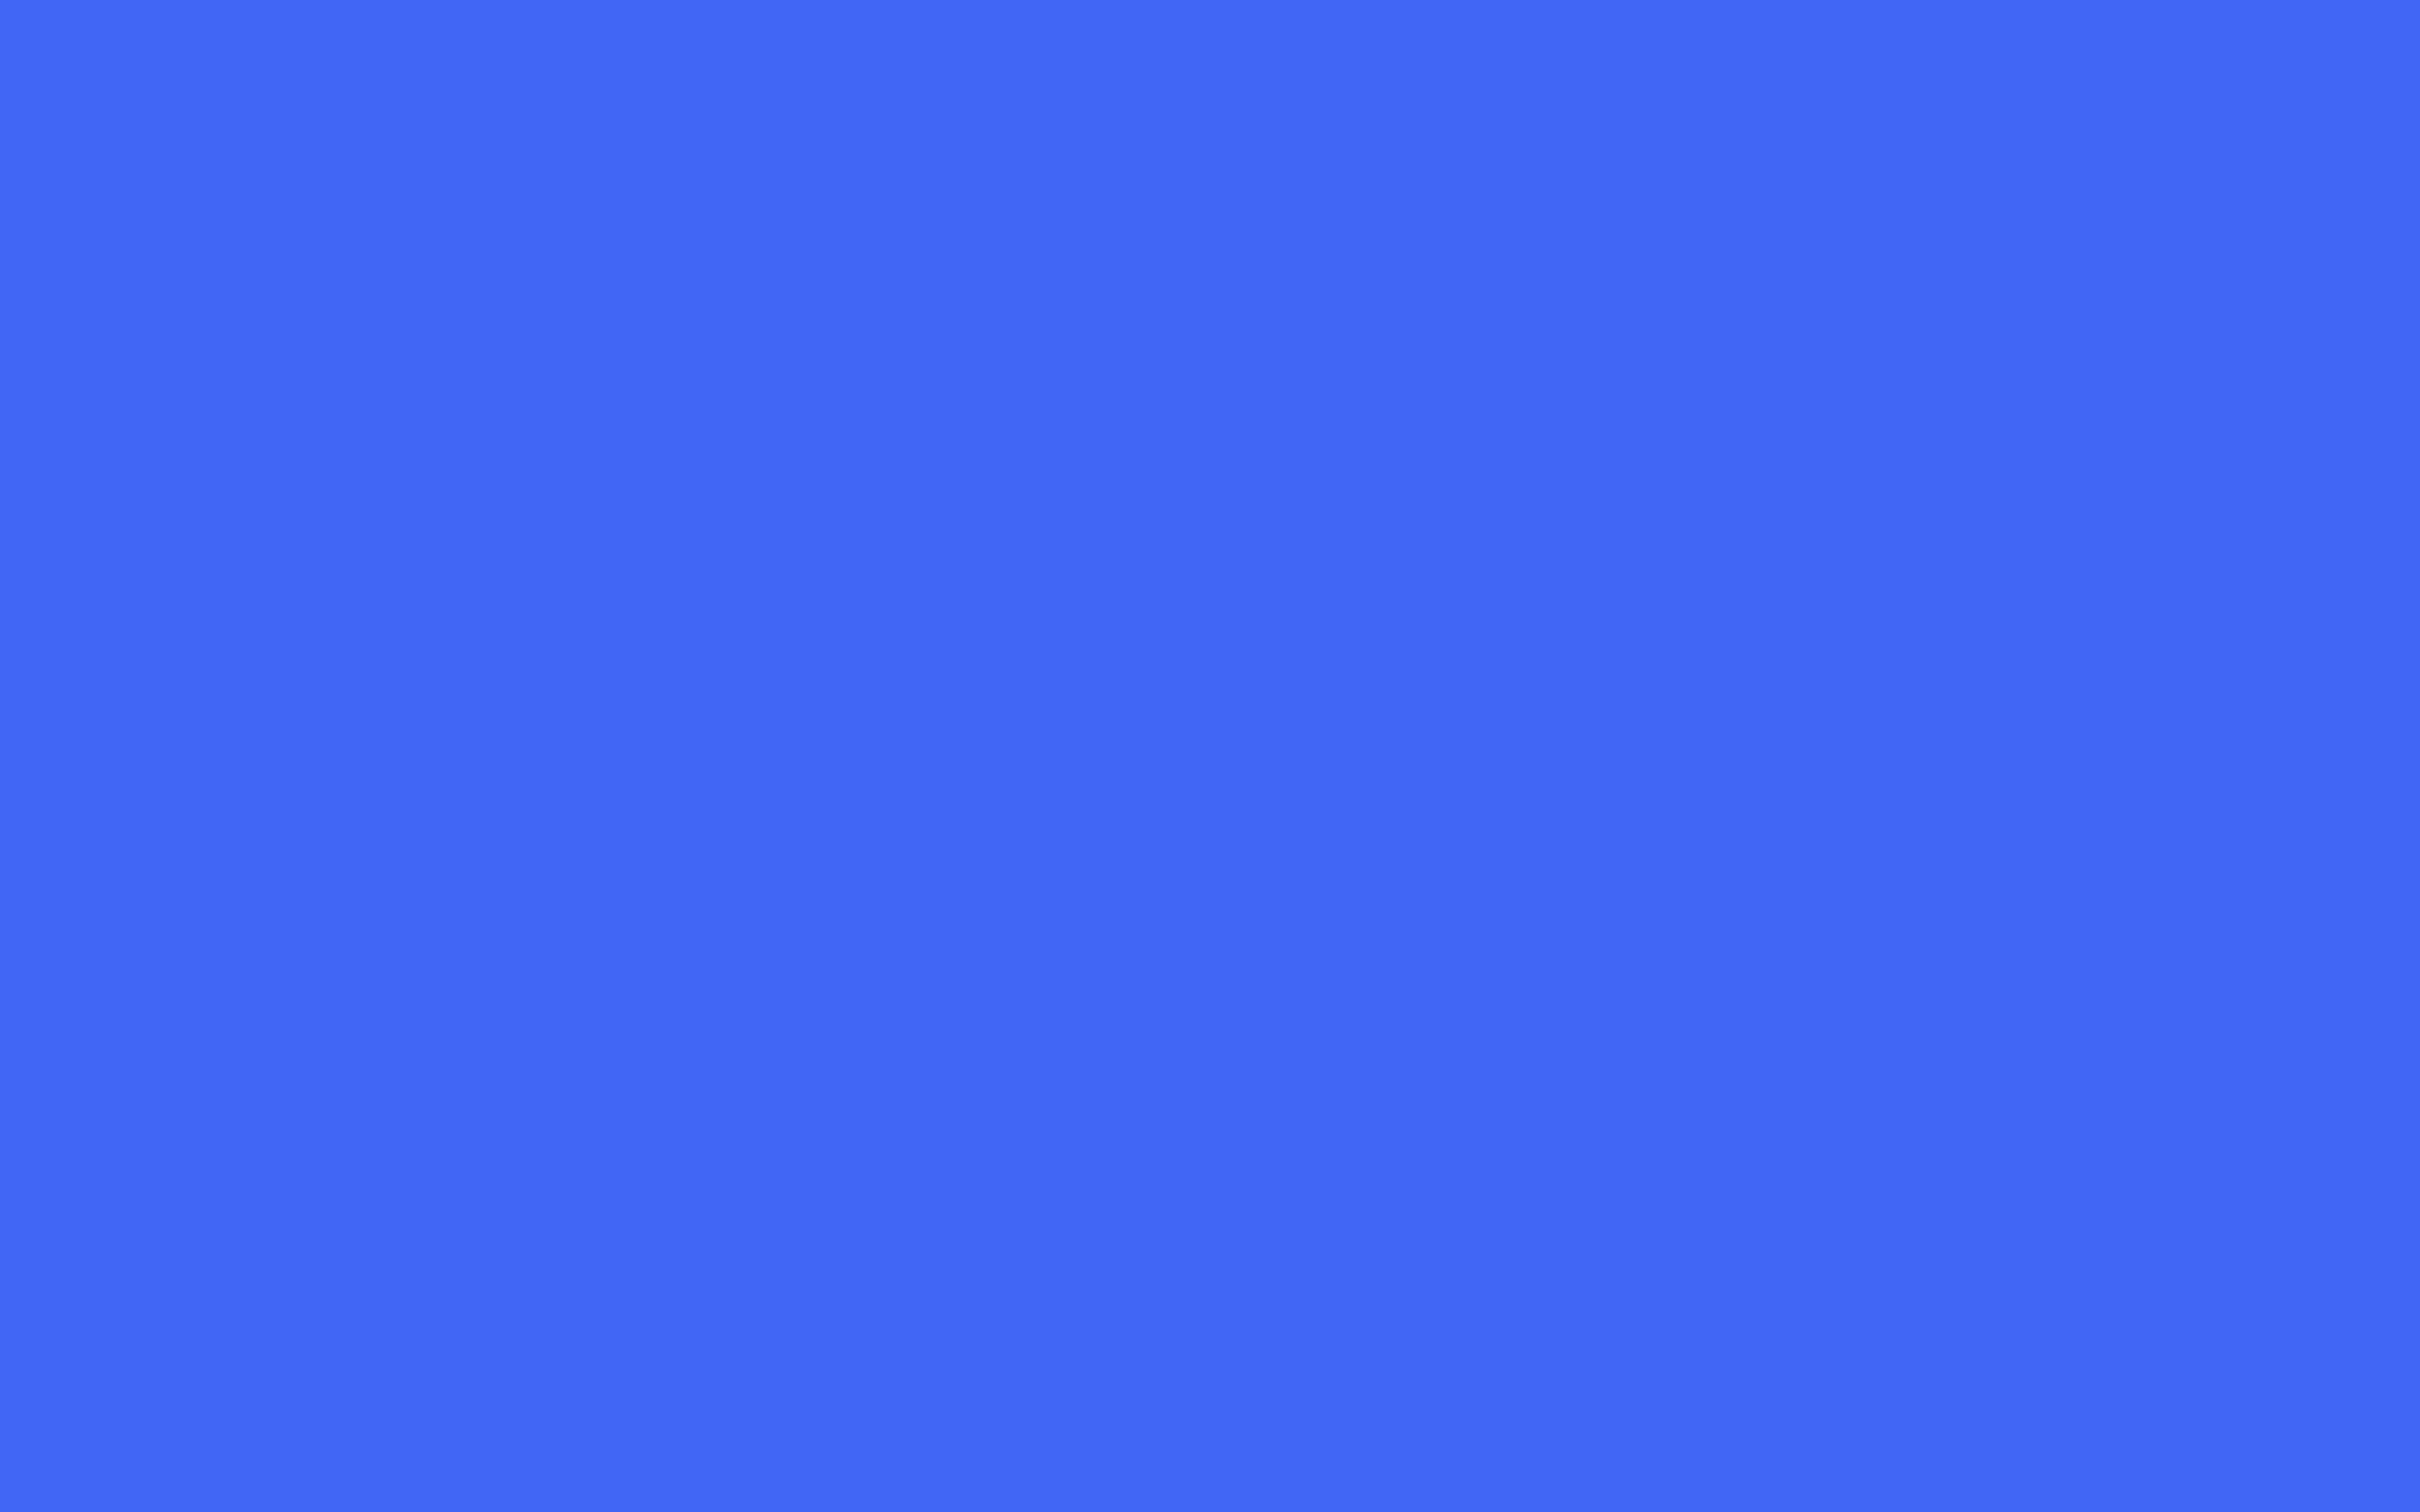 2560x1600 Ultramarine Blue Solid Color Background